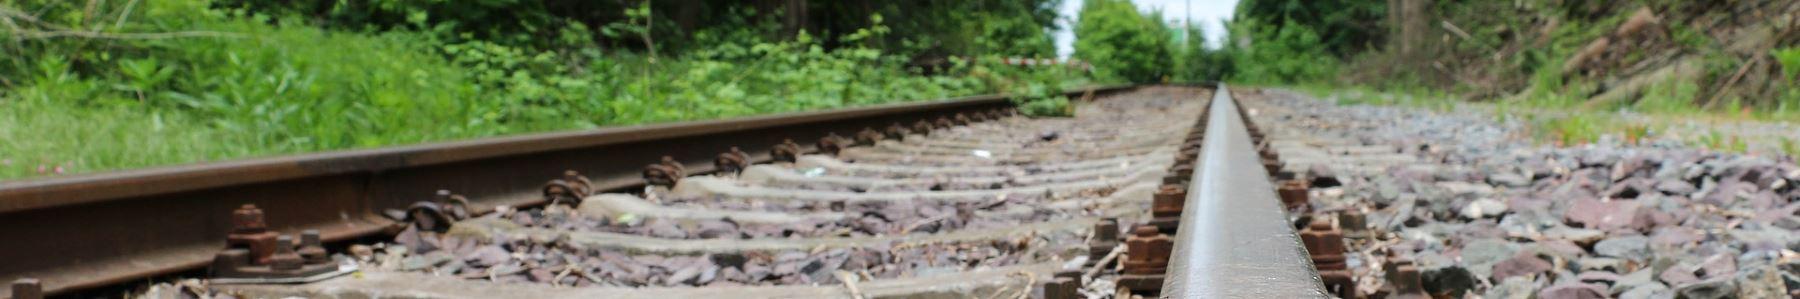 Railway Station - Trenitalia spa